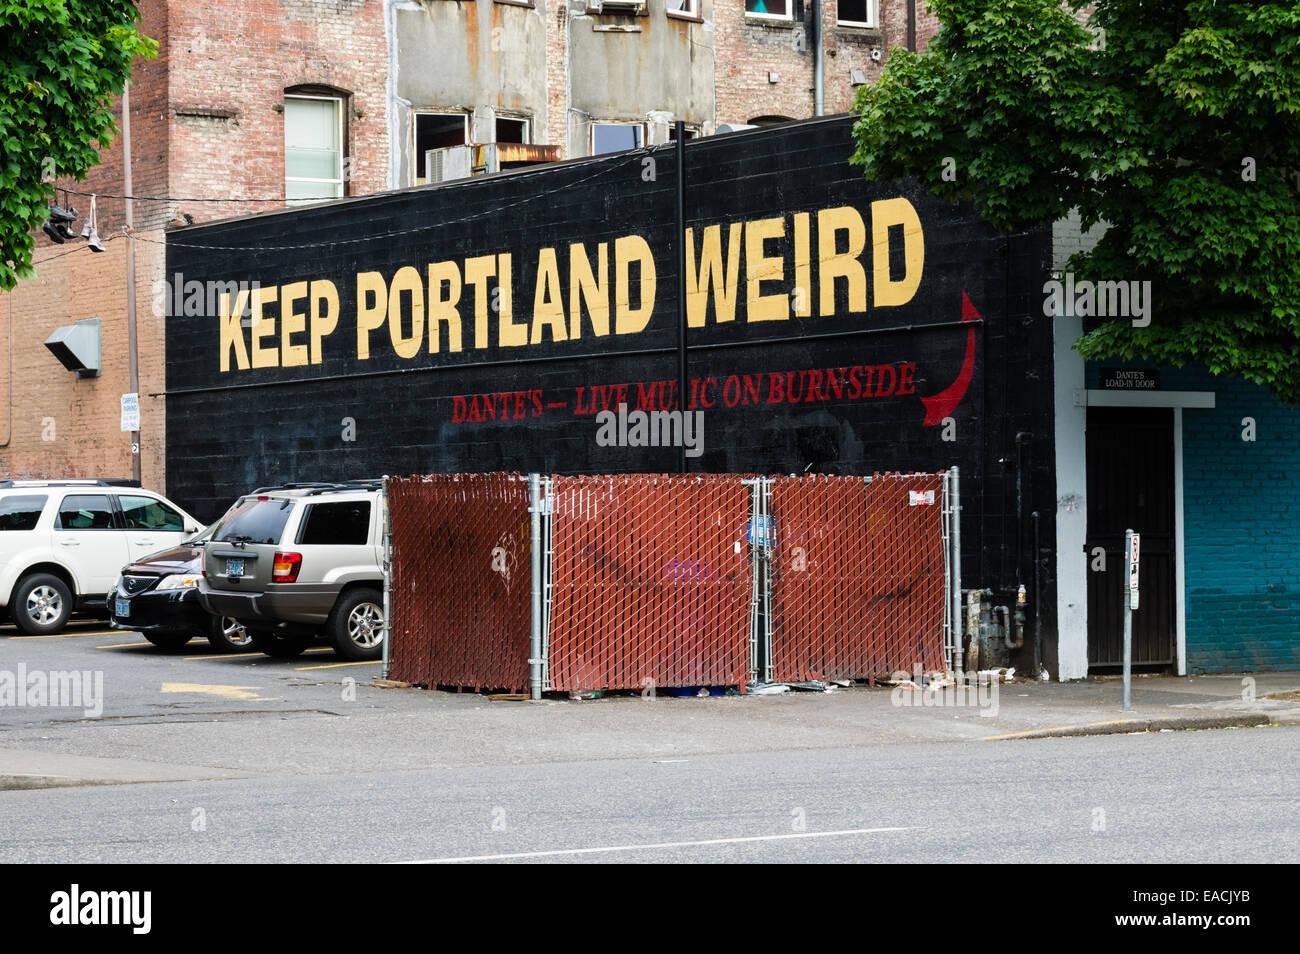 Keep Portland Weird billboard on downtown city street.  Portland, Oregon - Stock Image